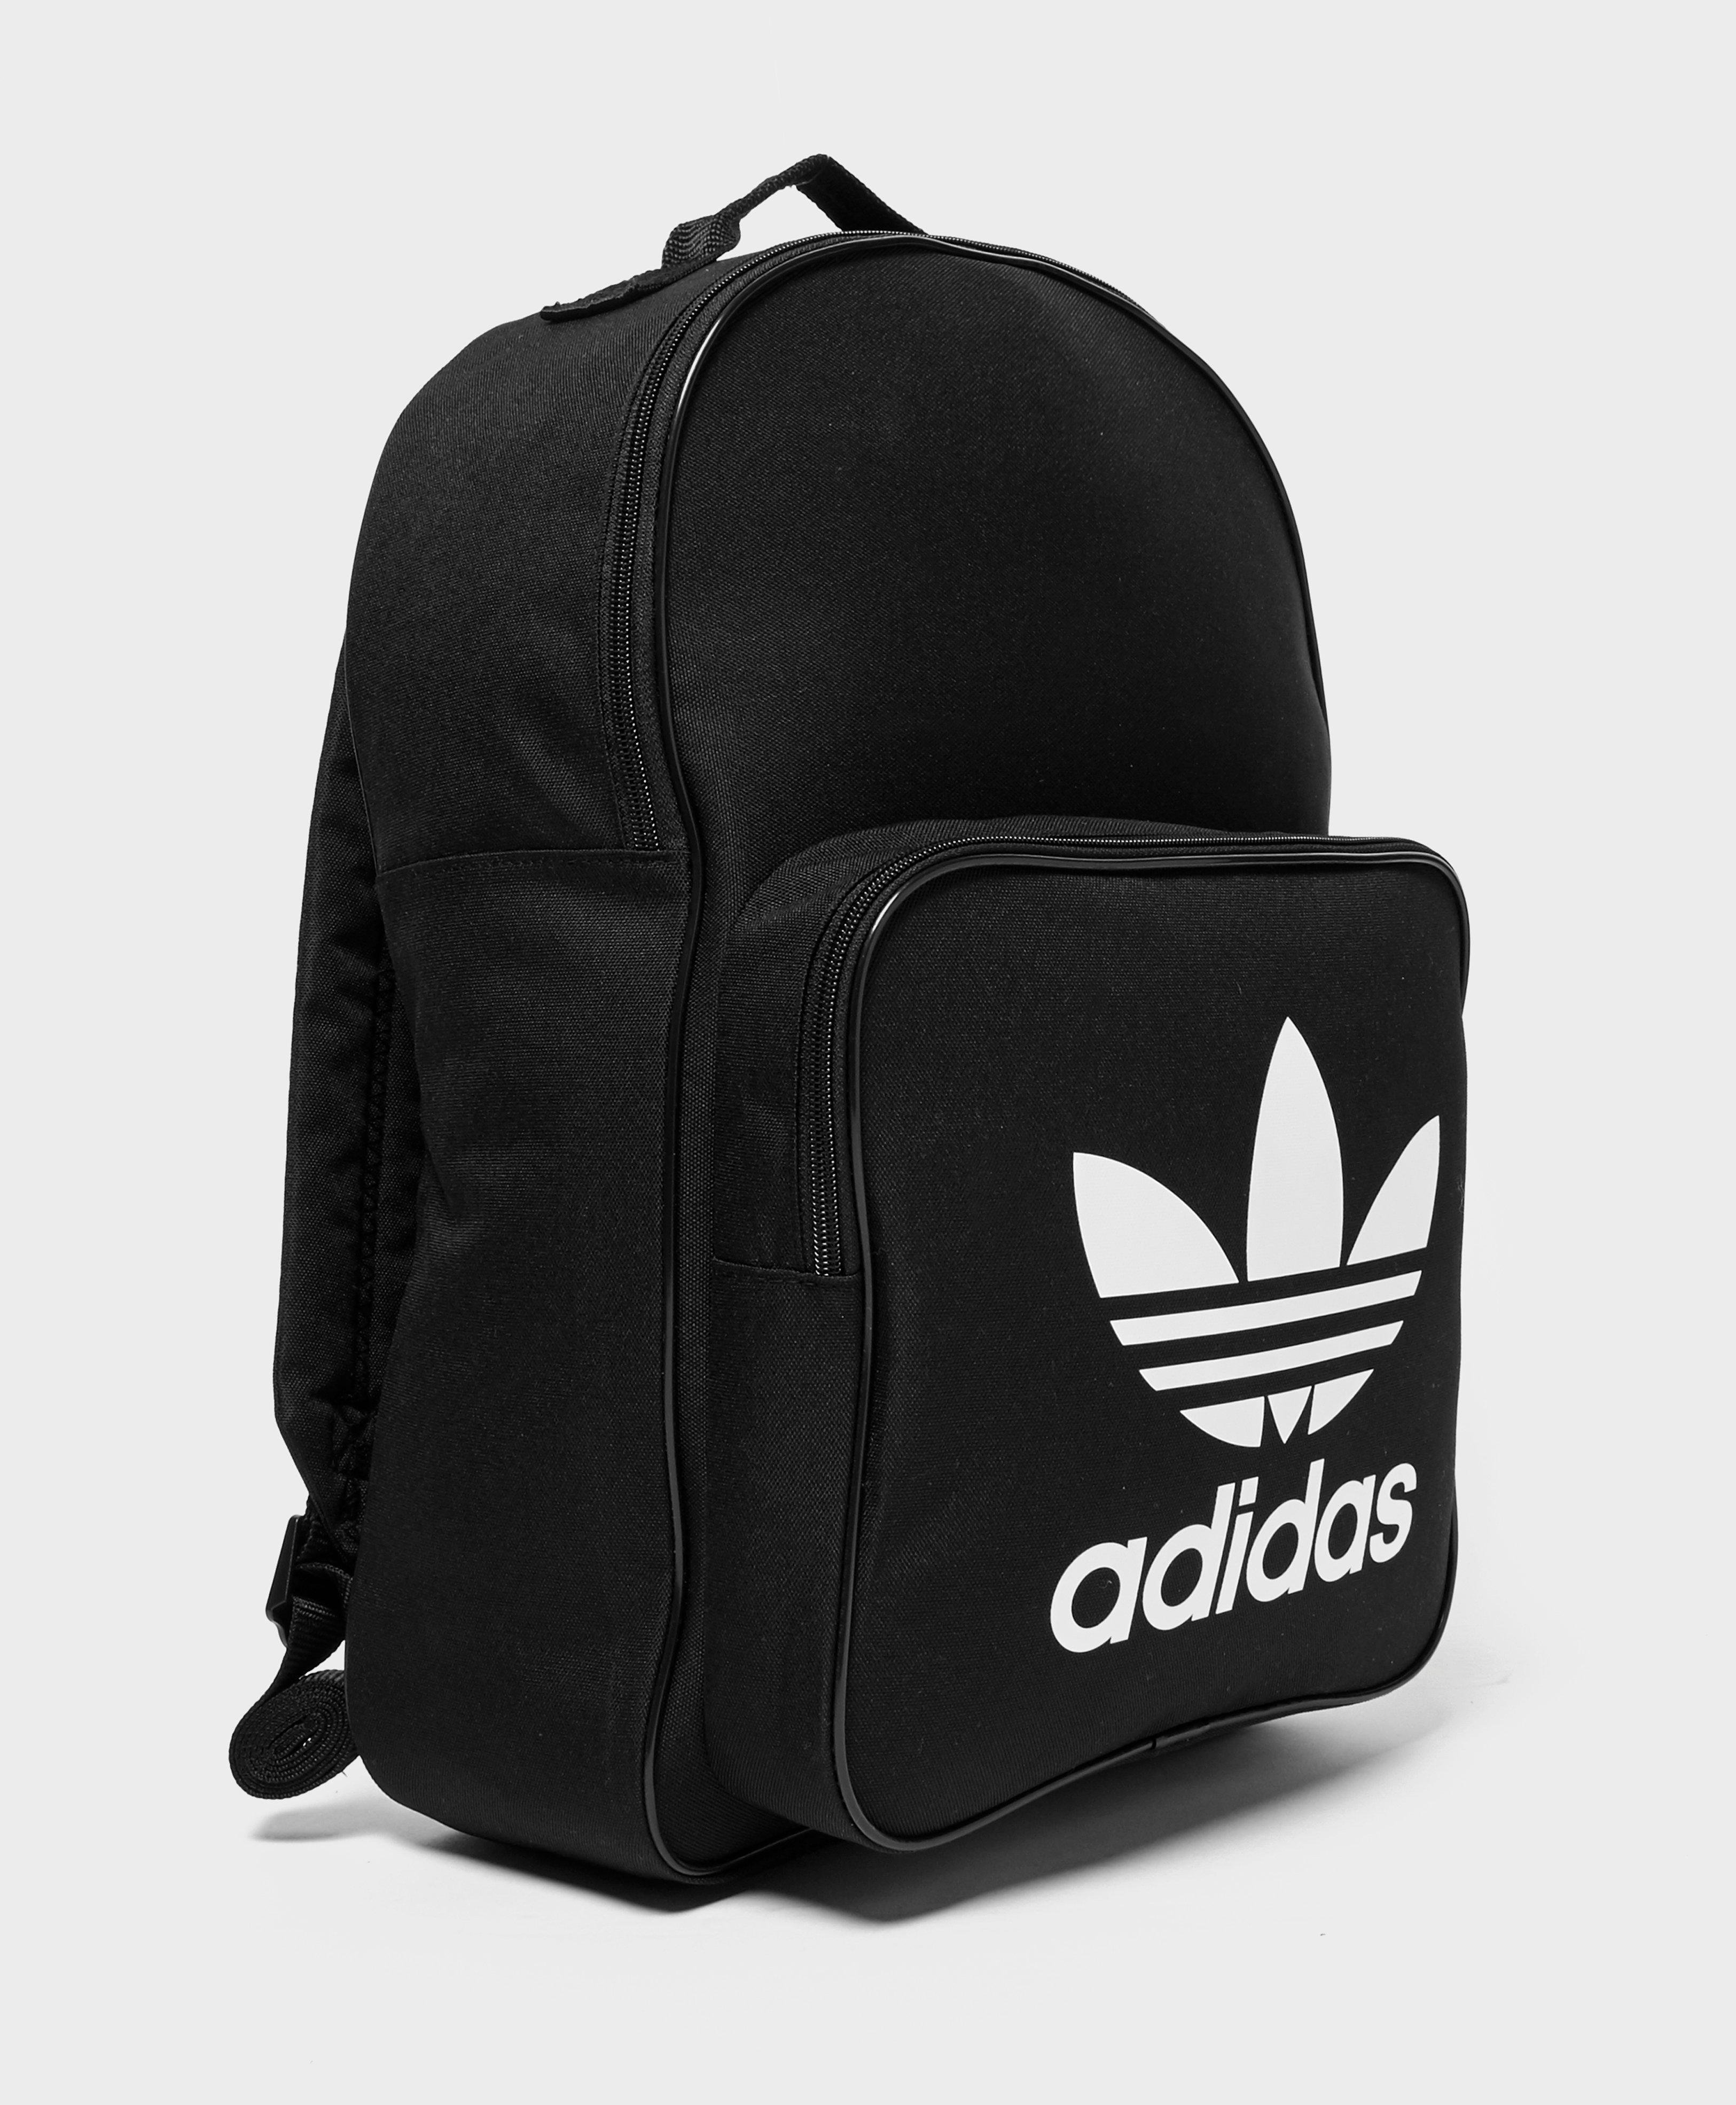 3da8fb29b2 adidas Originals Classic Trefoil Backpack in Black for Men - Lyst